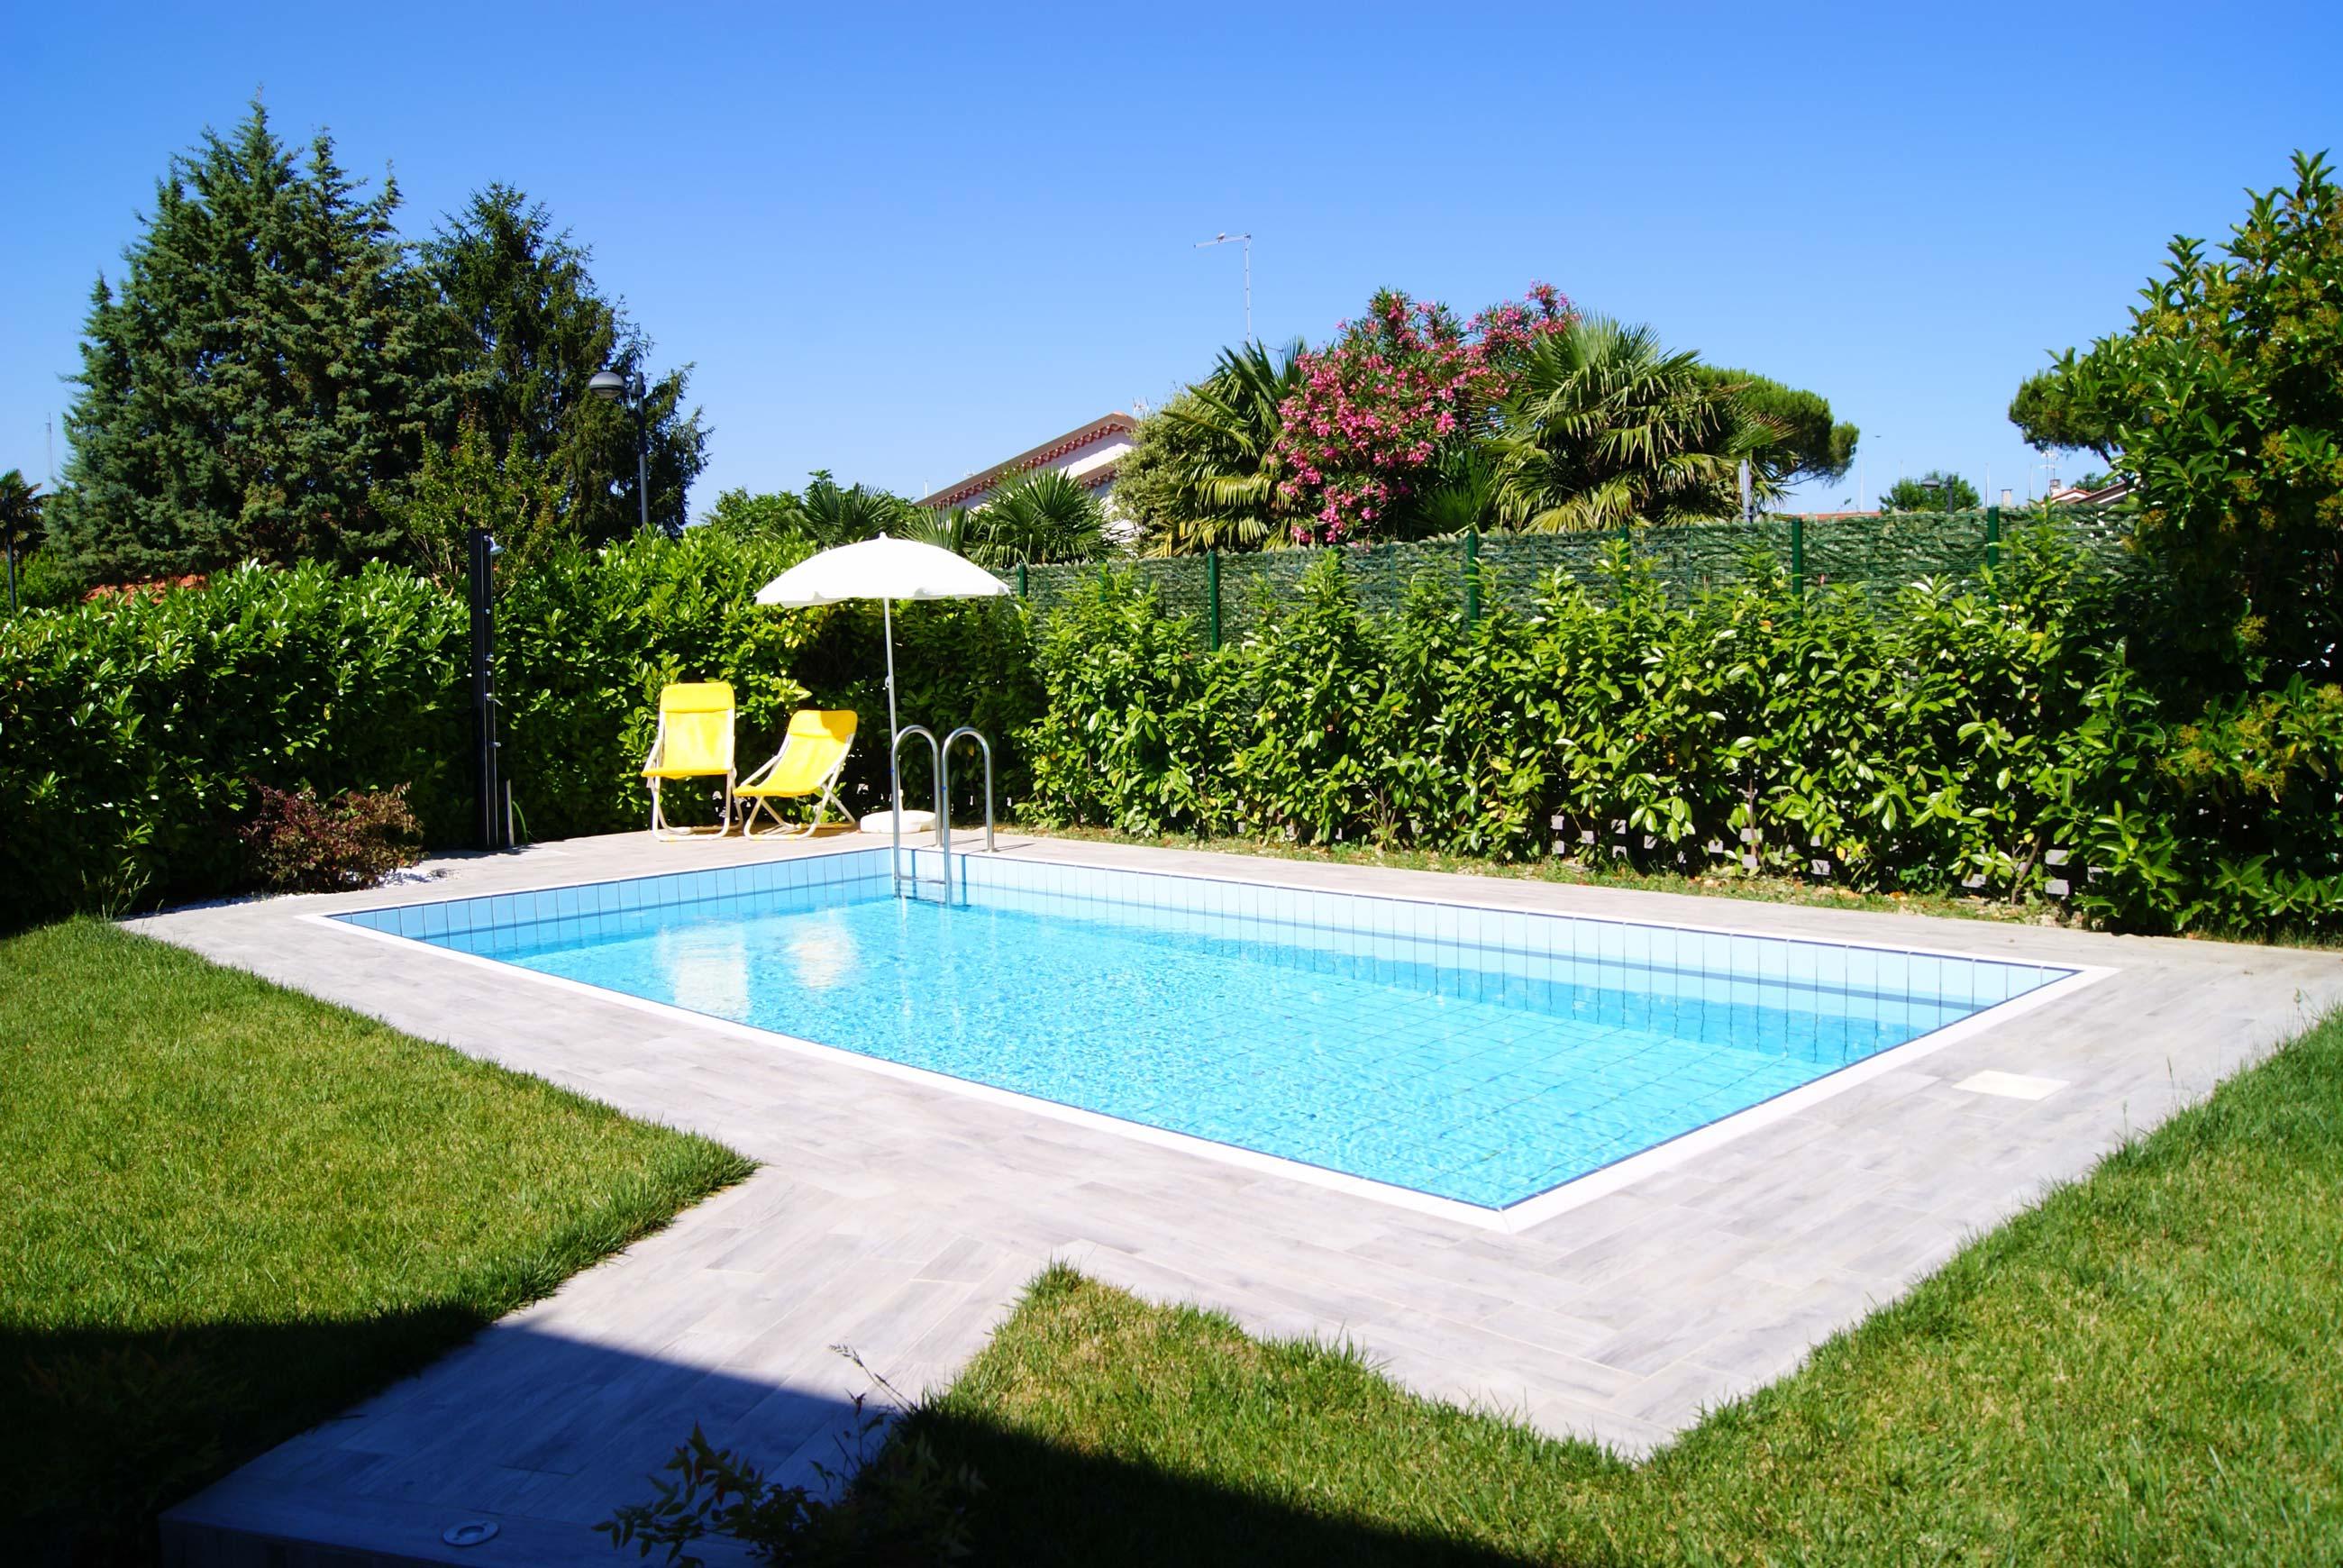 giardino con piscina, sedie a sdraio con ombrellone e doccia